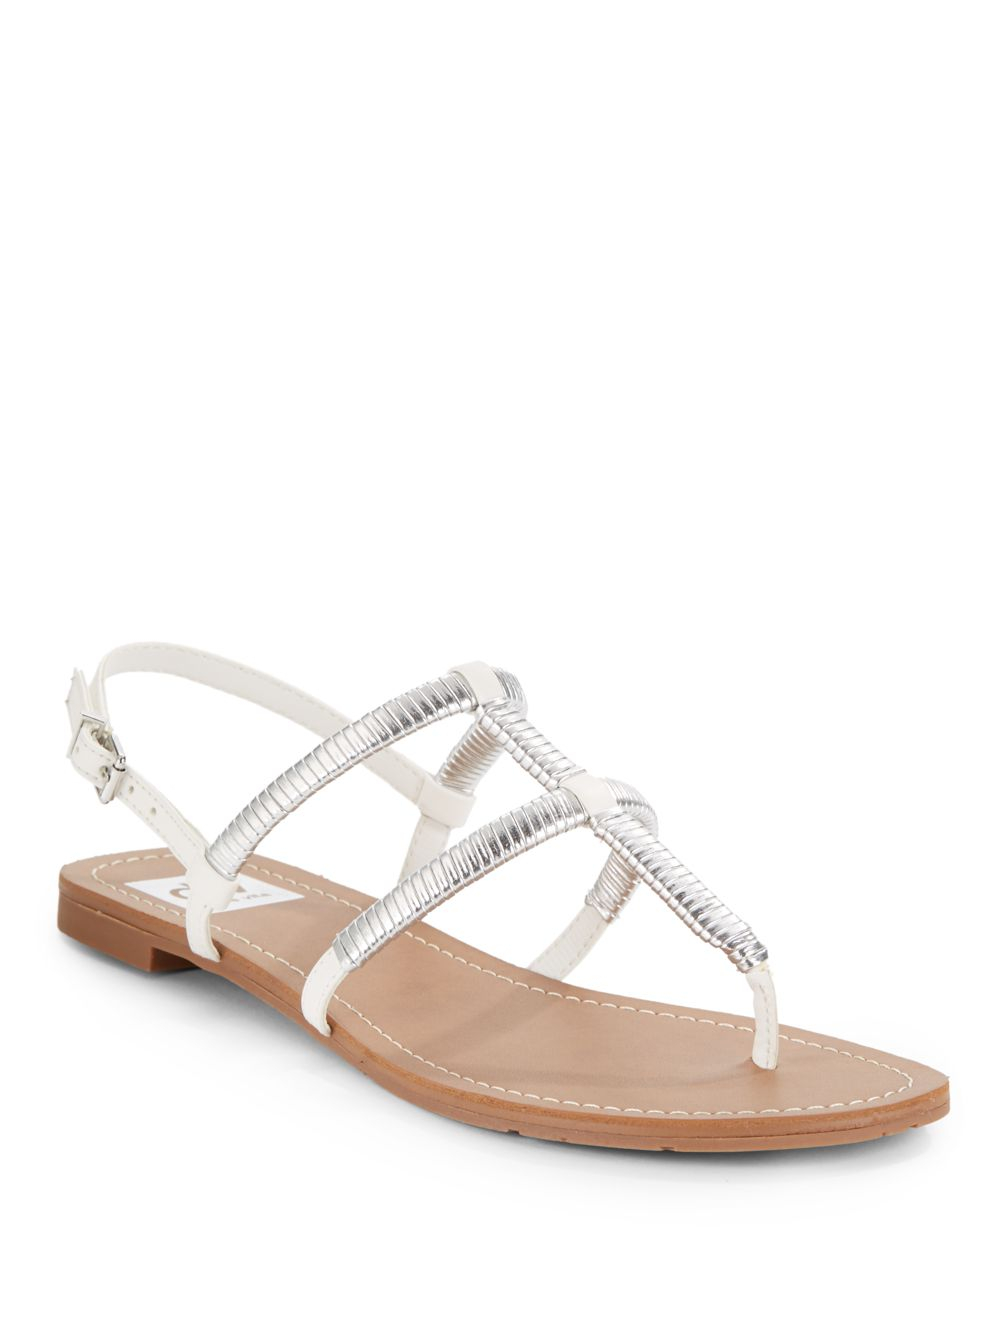 Dv By Dolce Vita Gava Silver Metallic-Trimmed Flat Sandals ...